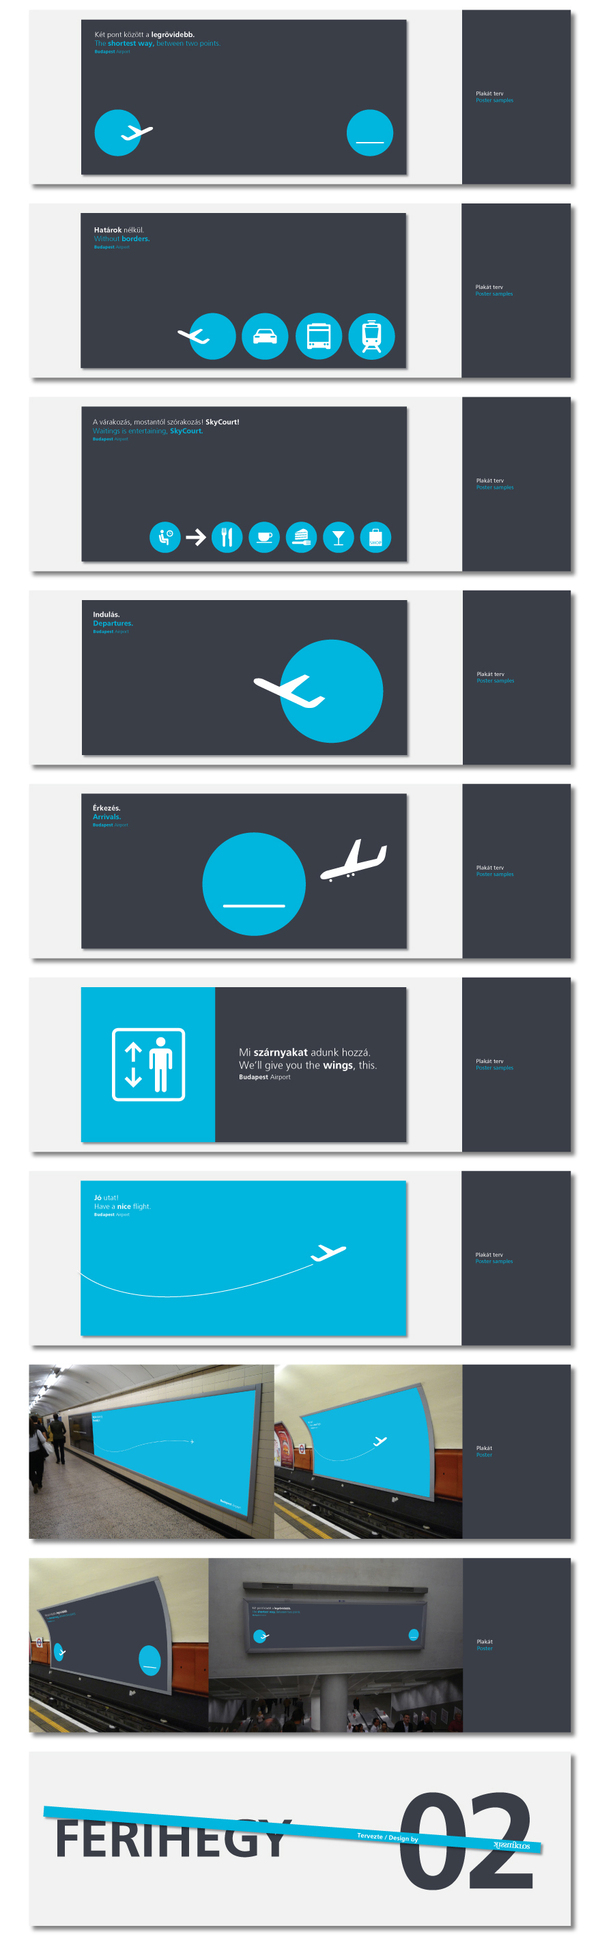 BUD Terminal2 Graphics Concept / 2010